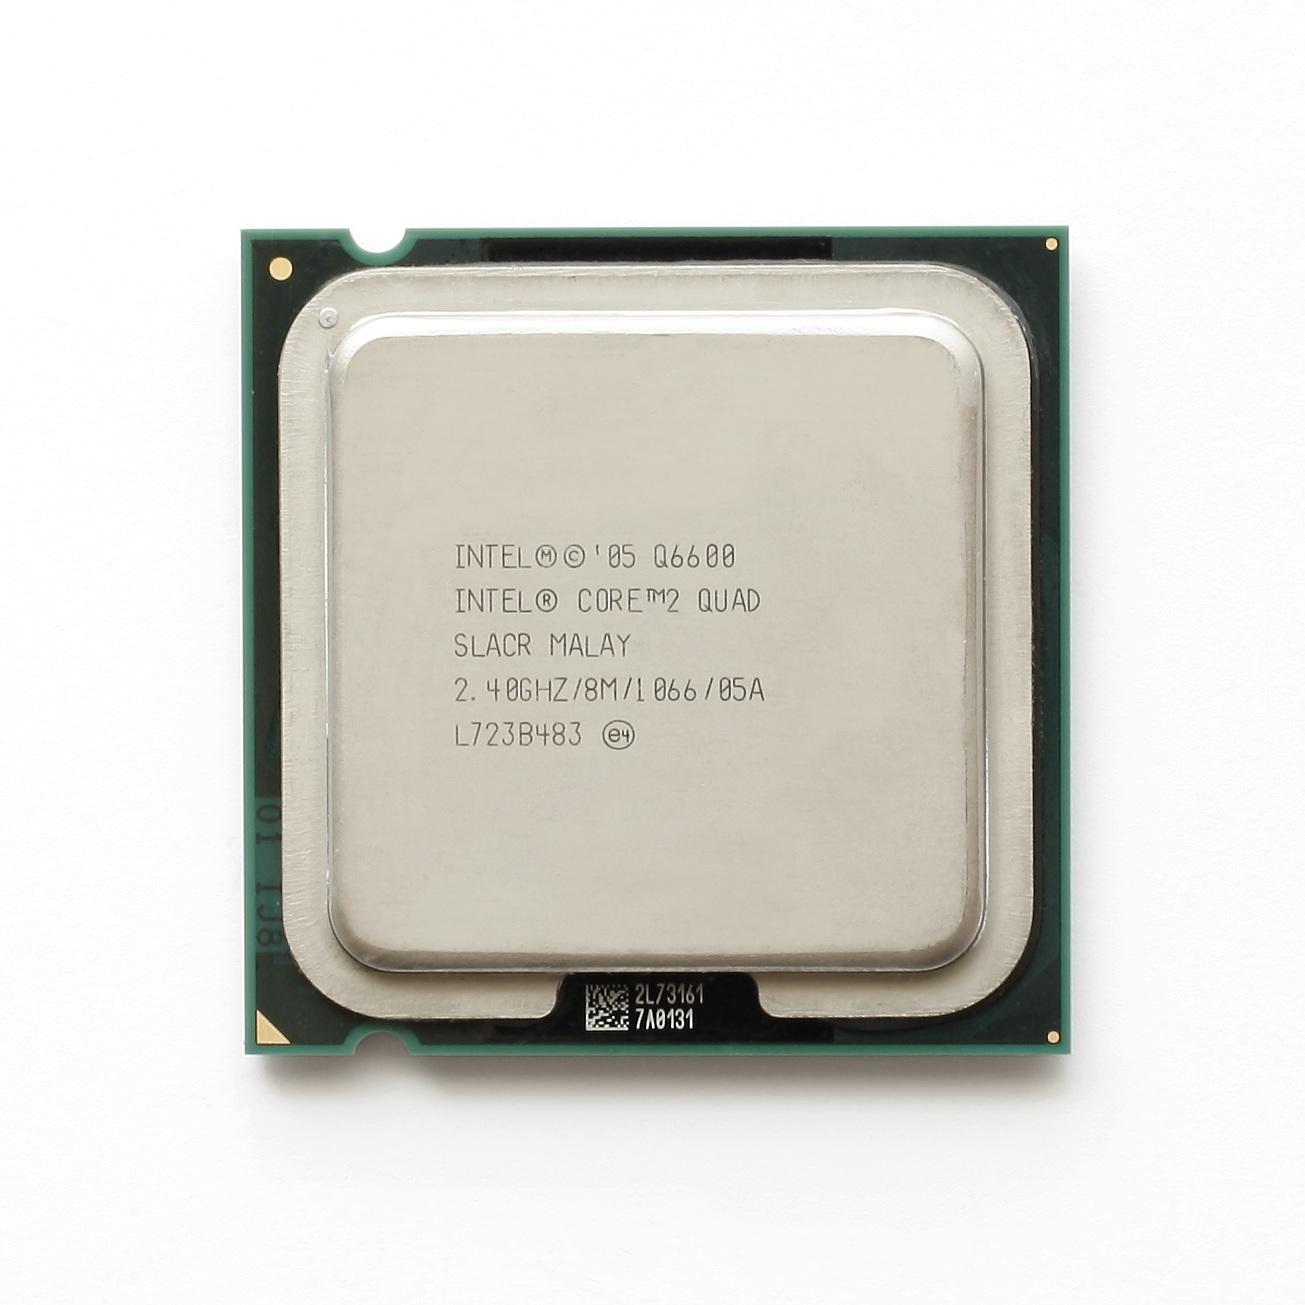 intel core 2 quad processor q6600 8m cache ghz 1066 mhz fsb pret 250ron. Black Bedroom Furniture Sets. Home Design Ideas